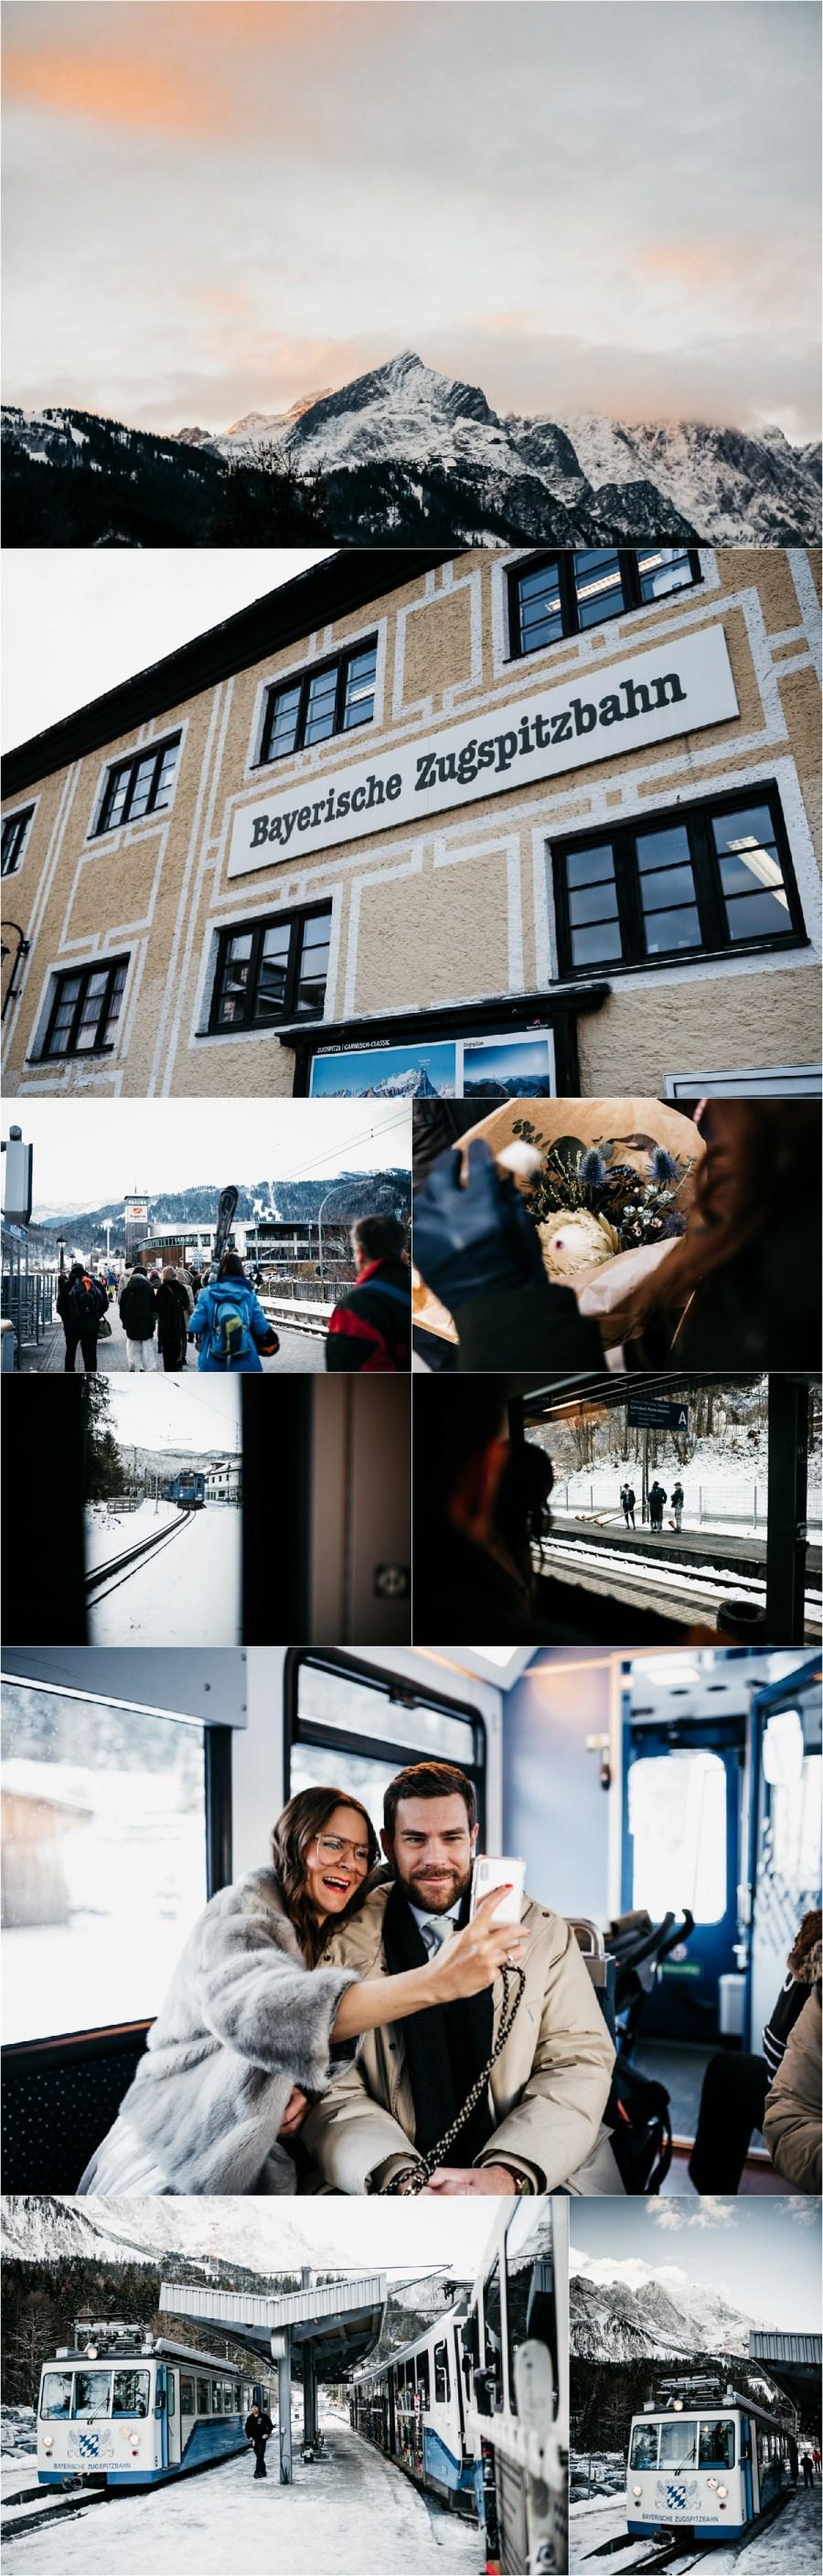 The Bride and Groom ride the Zugspitzbahn in Garmisch Partenkirchen by Aneta Lehotska